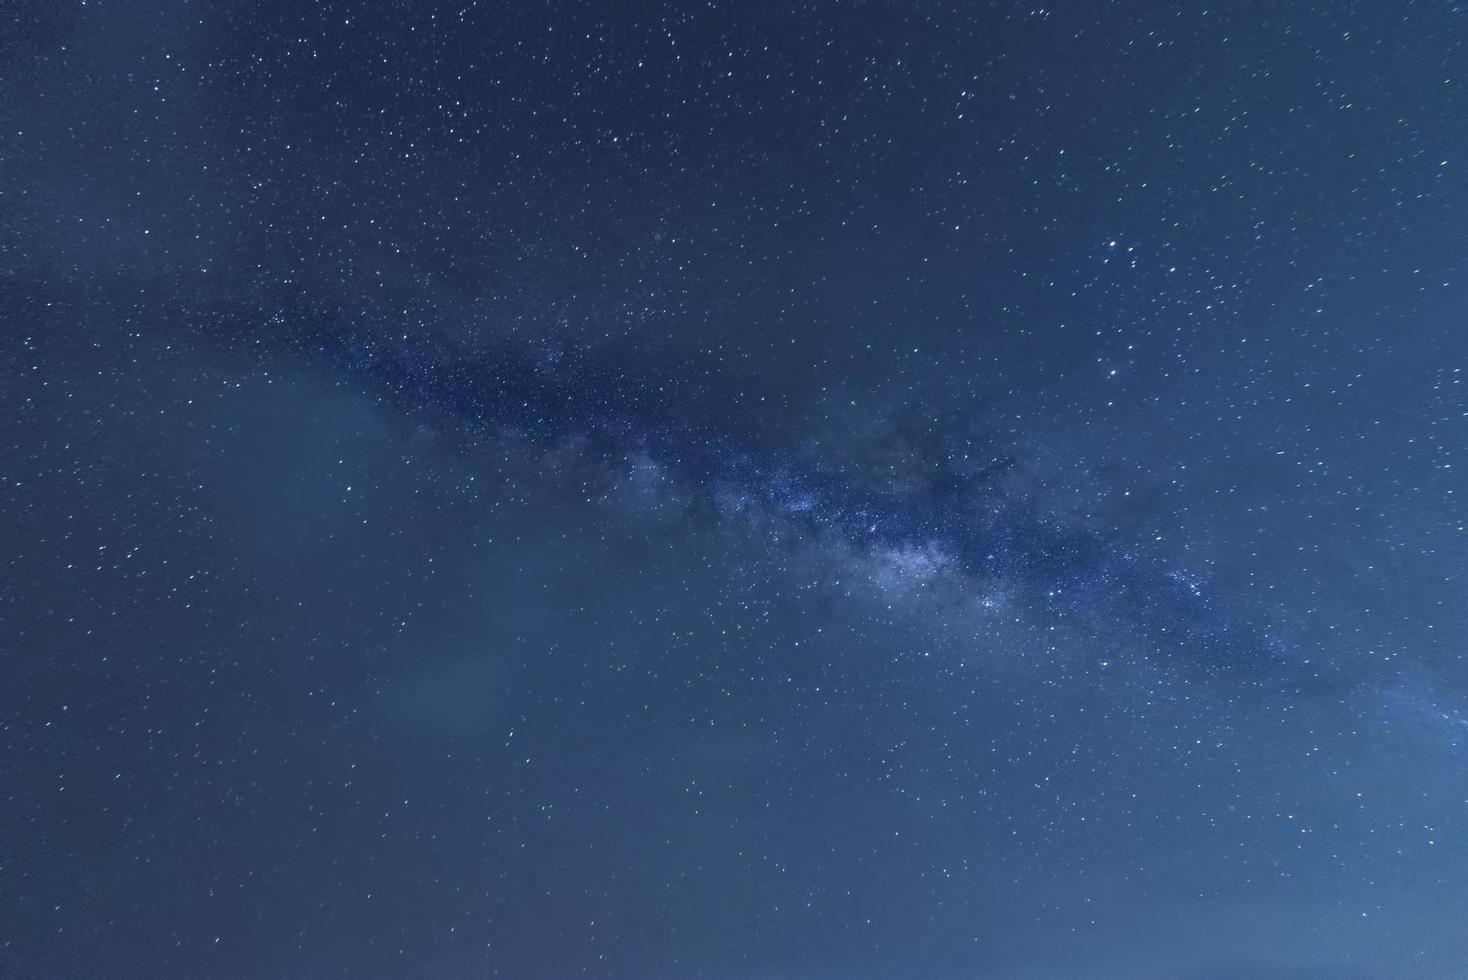 Milky Way and blue sky photo